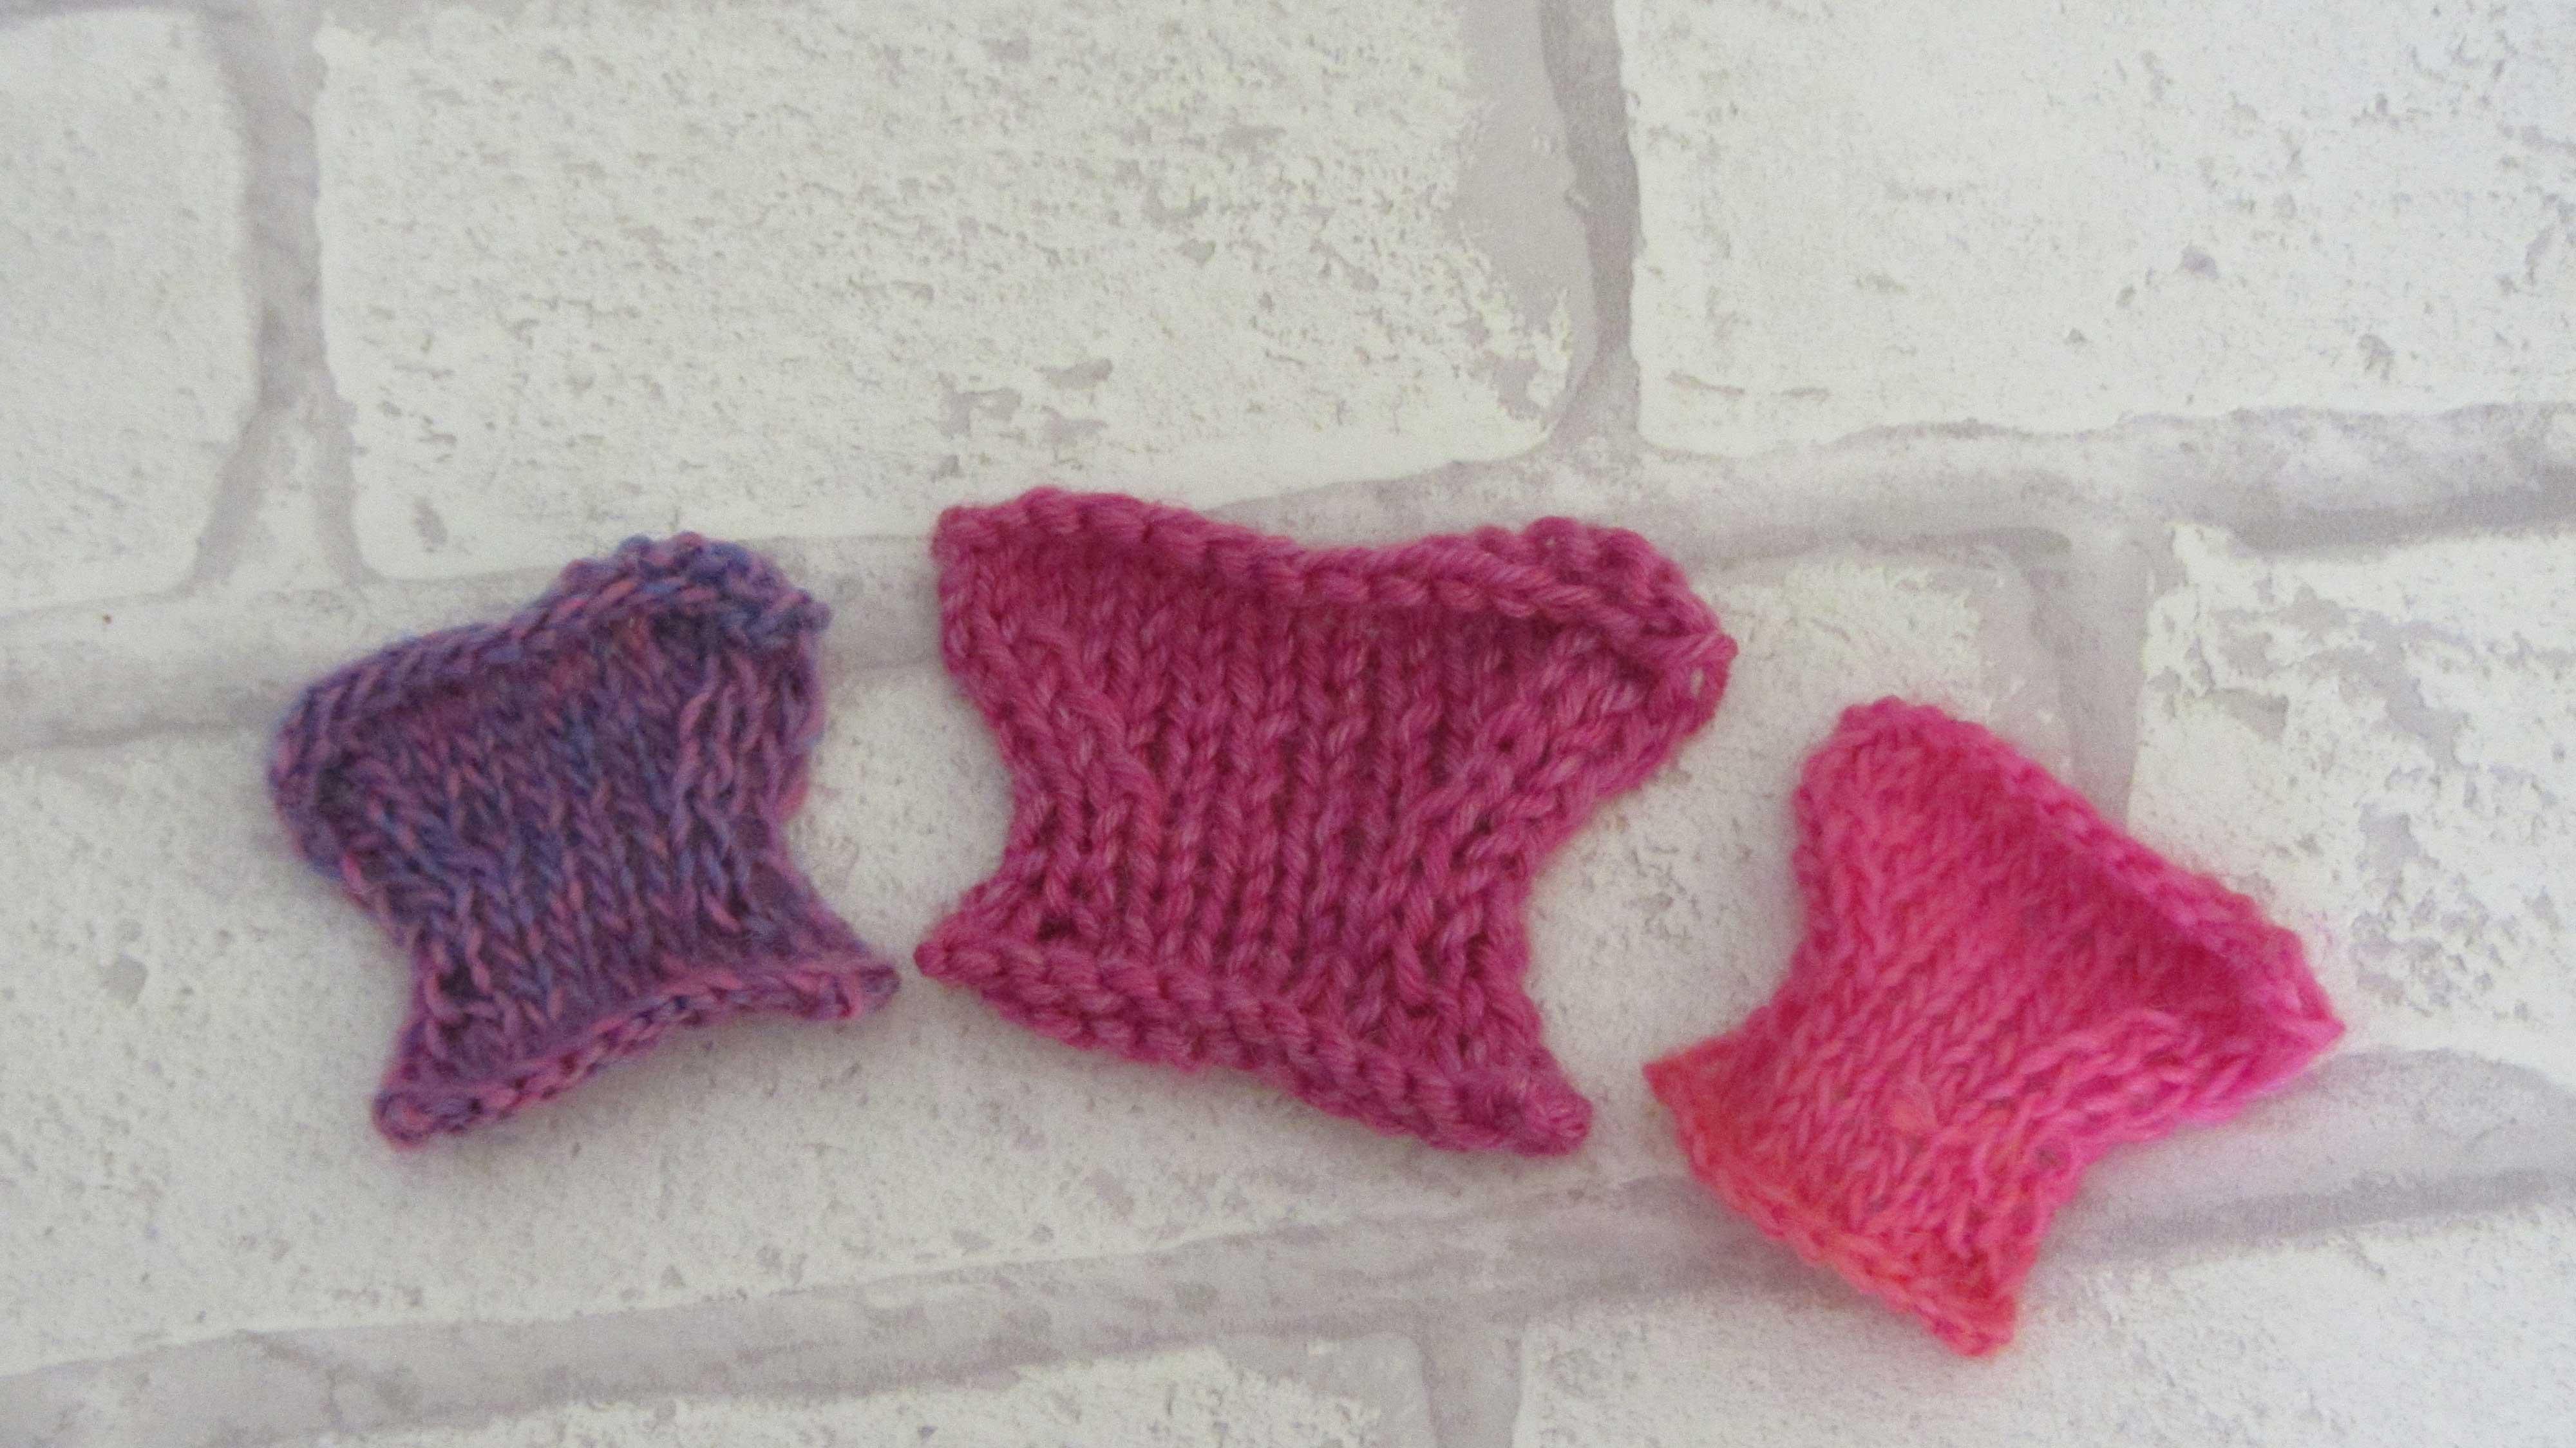 Knitting Pattern For Butterfly : Super Cute Knitted Butterfly TutorialJane Burns Jane Burns